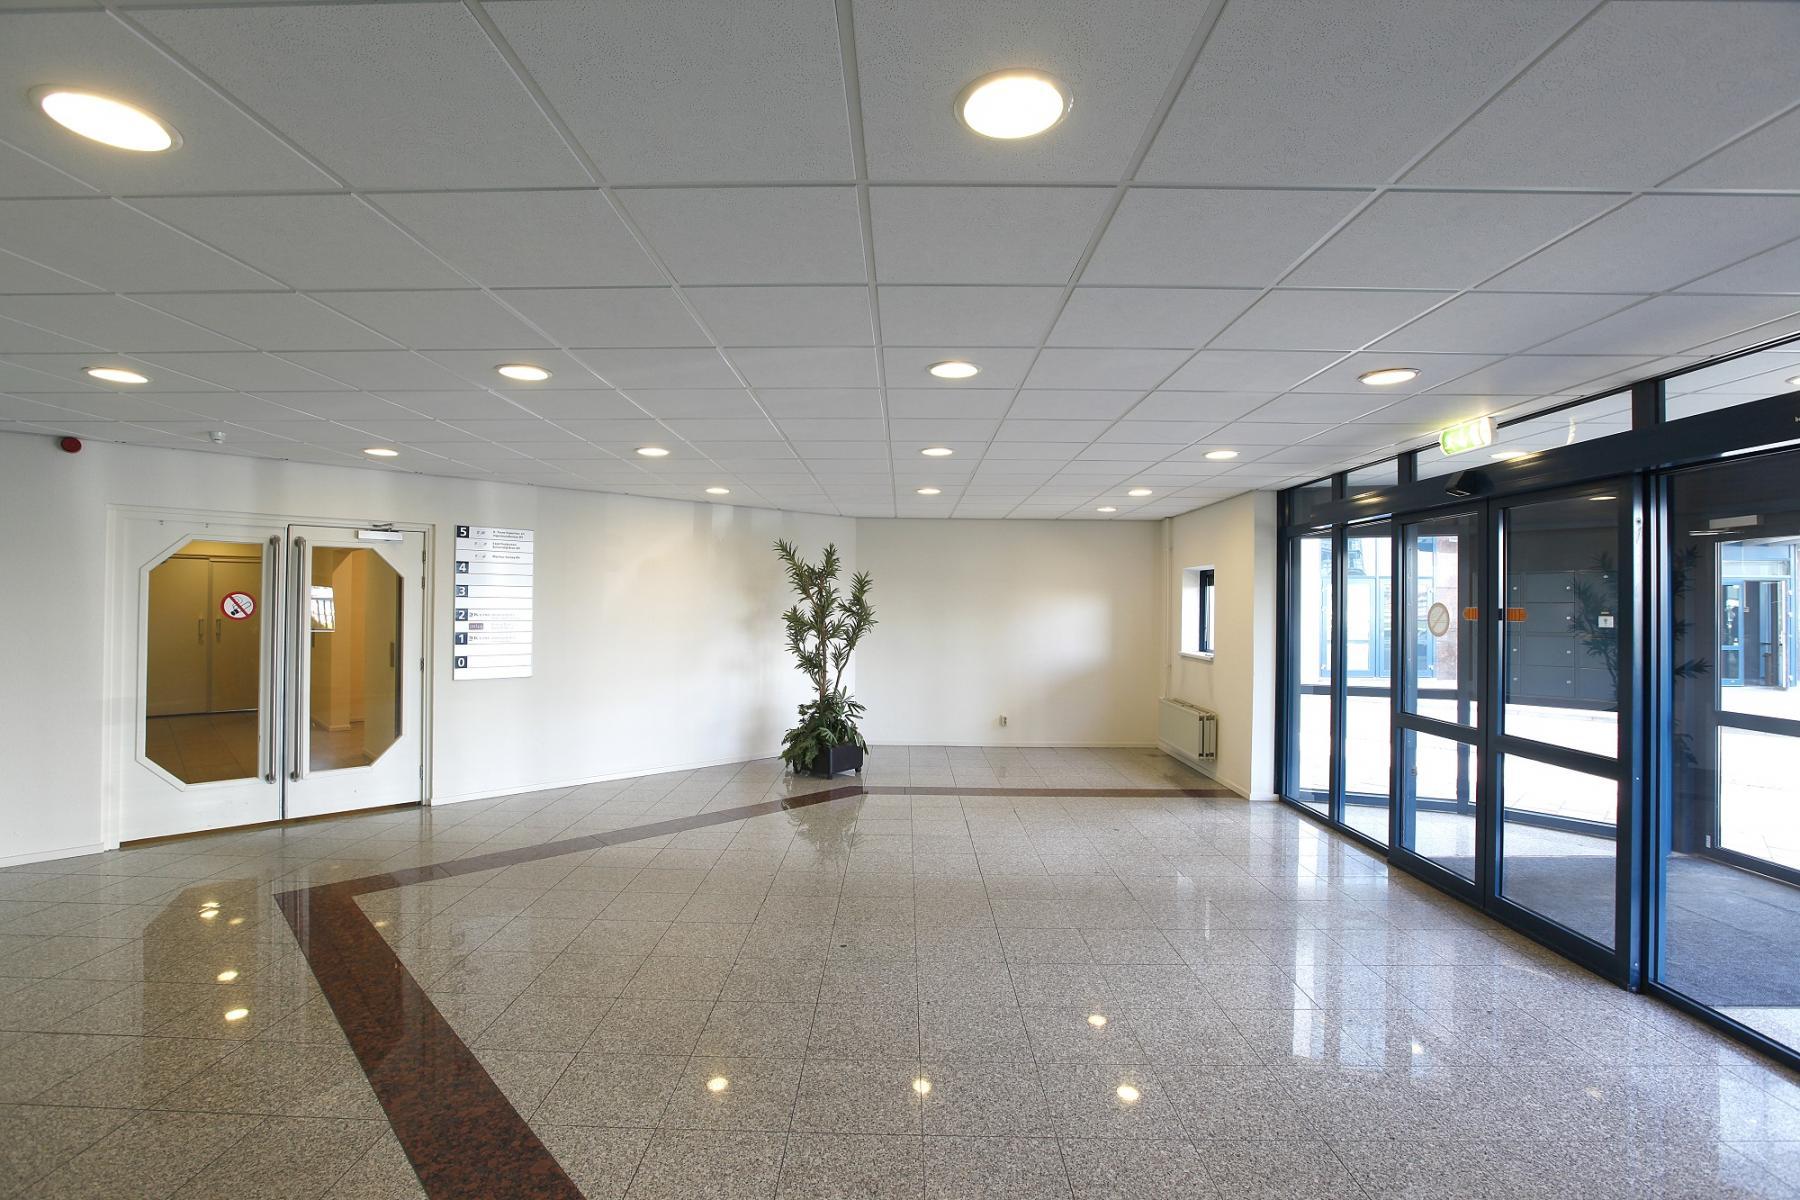 entrance office building doors green plant